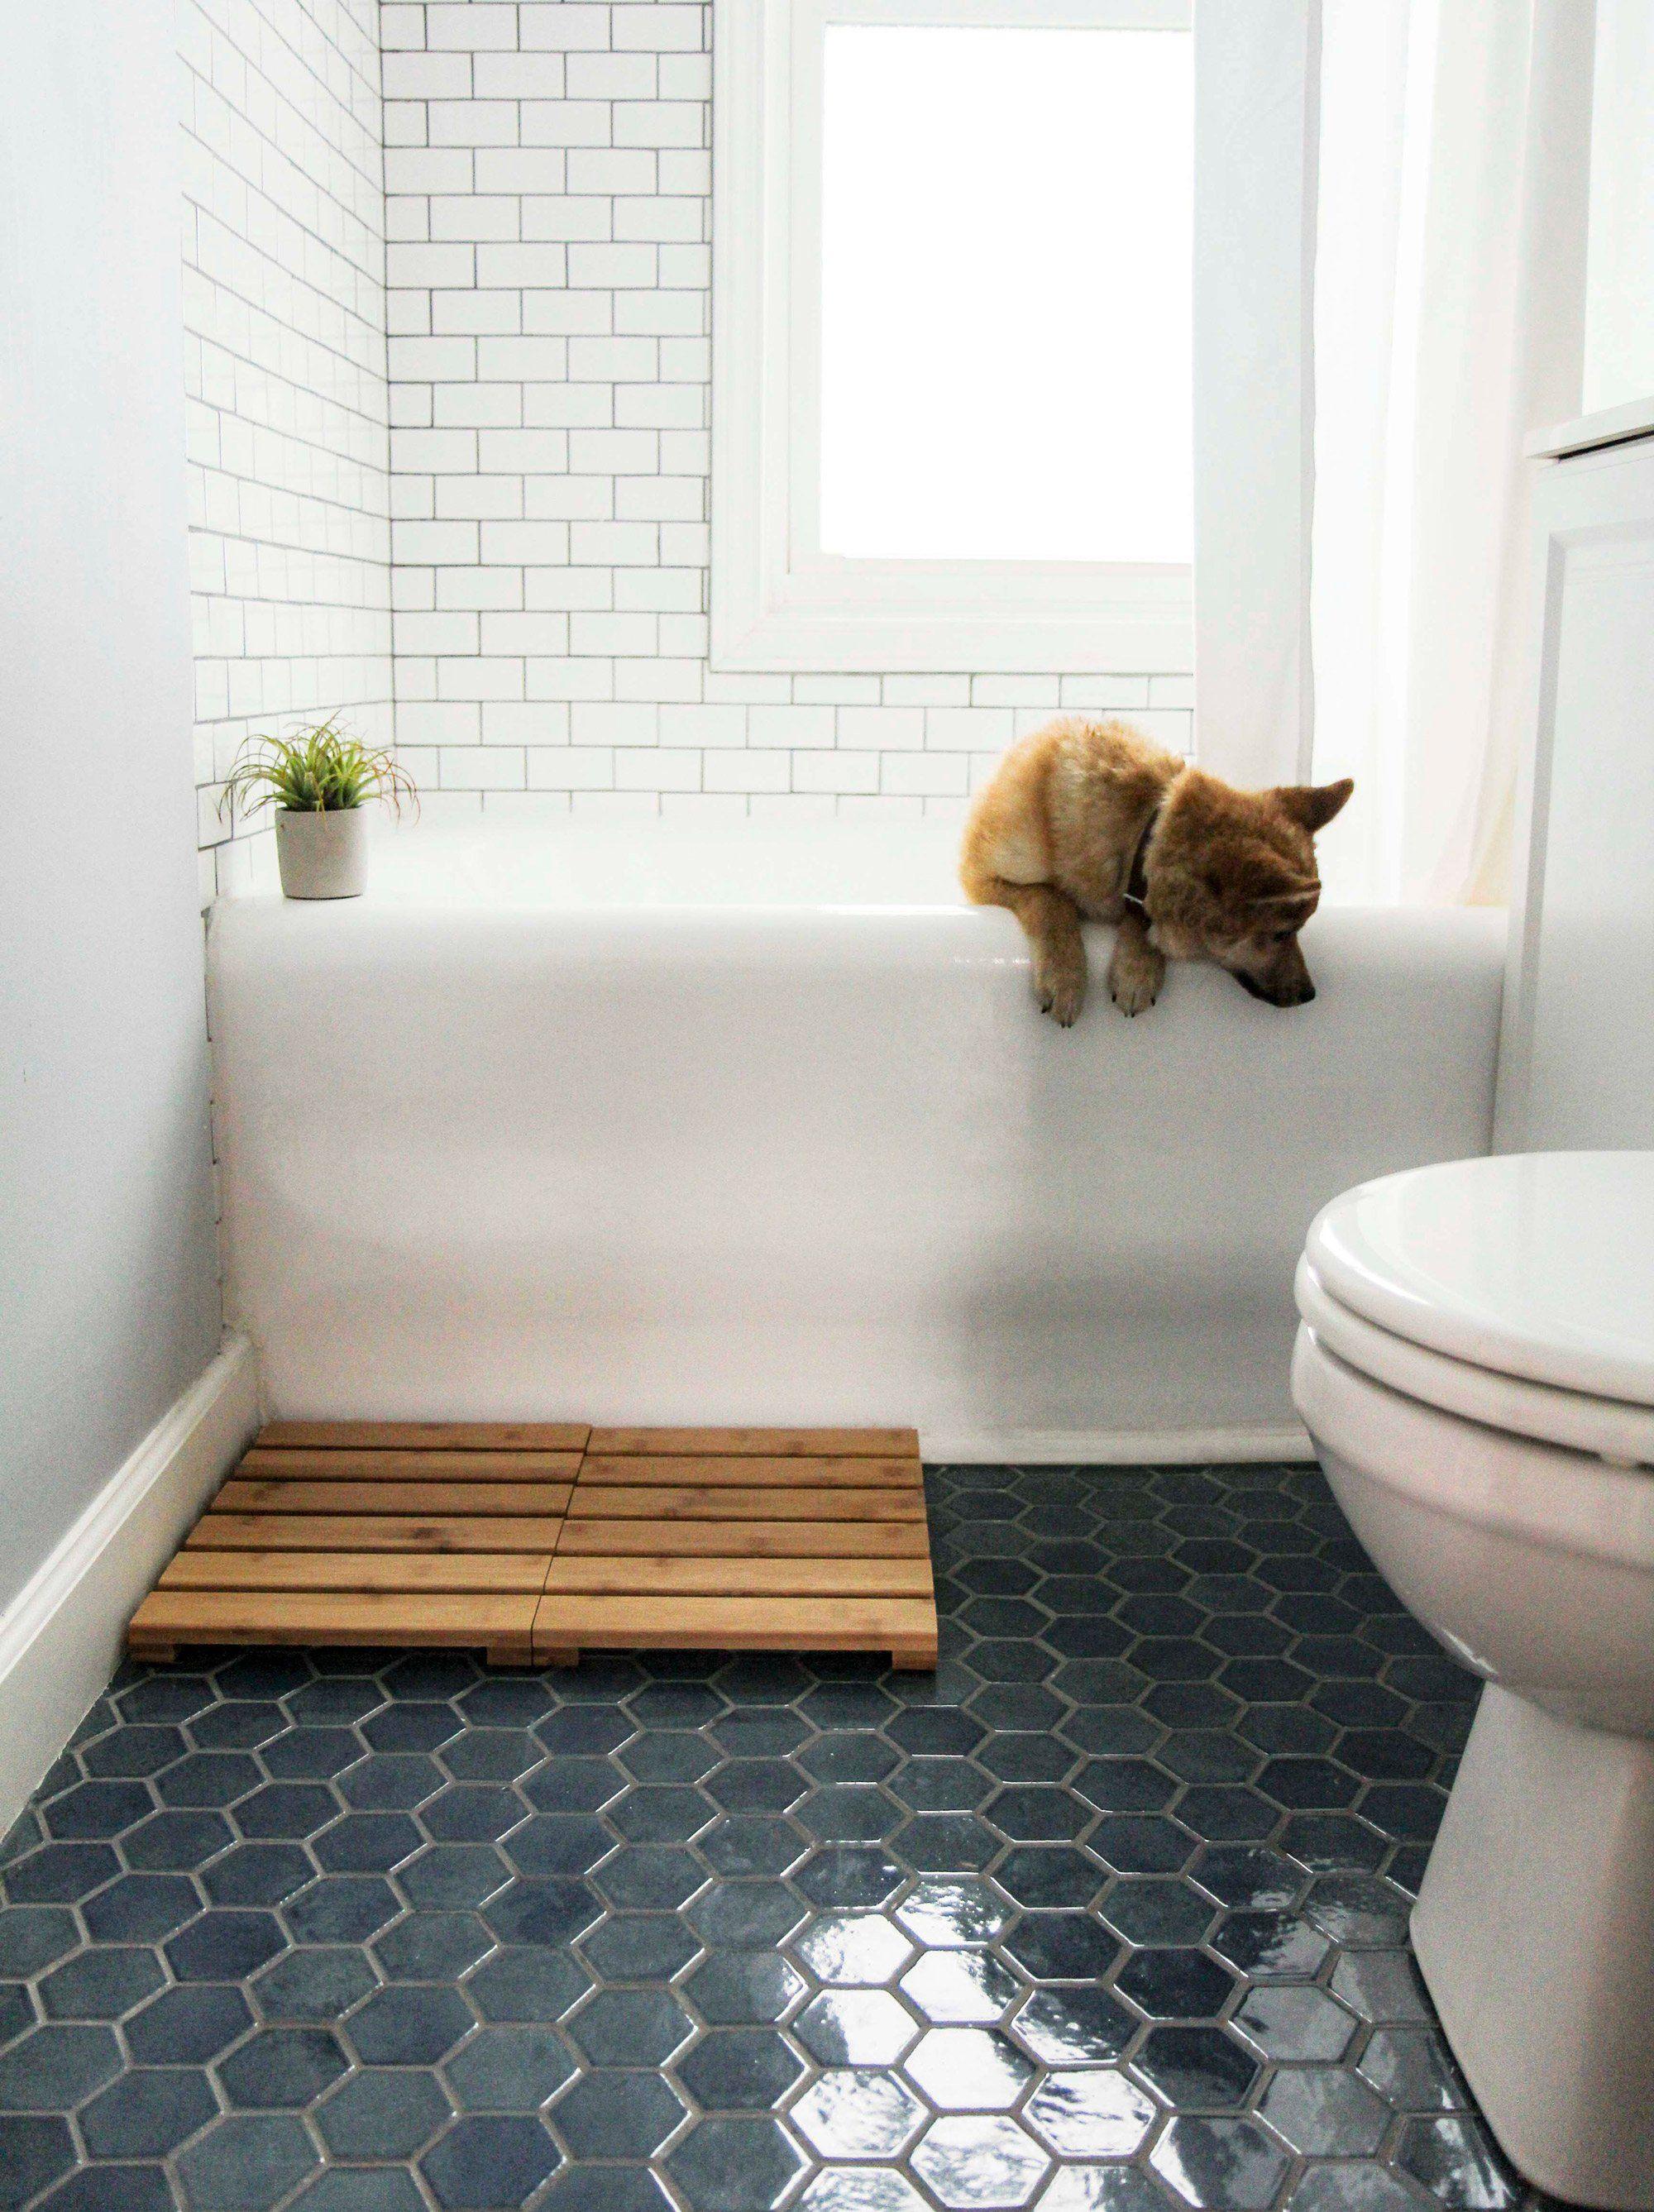 Small Hexagon 1013 Denim In 2021 Bathroom Tile Renovation Tile Renovation Tile Bathroom [ 2675 x 2000 Pixel ]